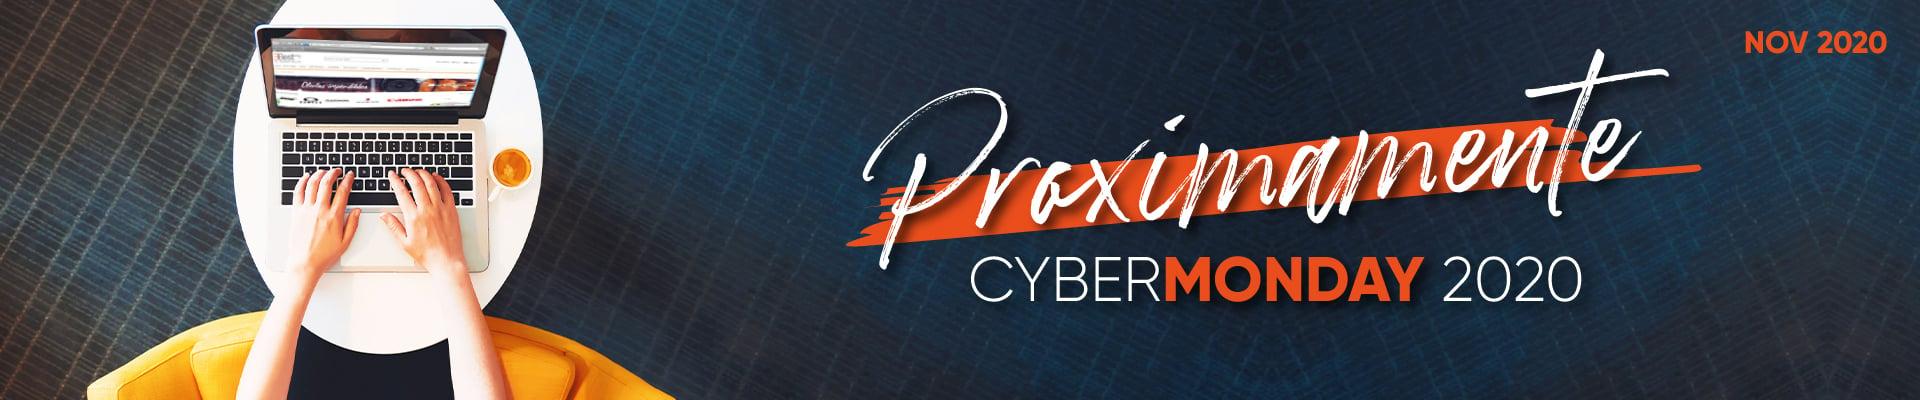 Cybermonday 2020